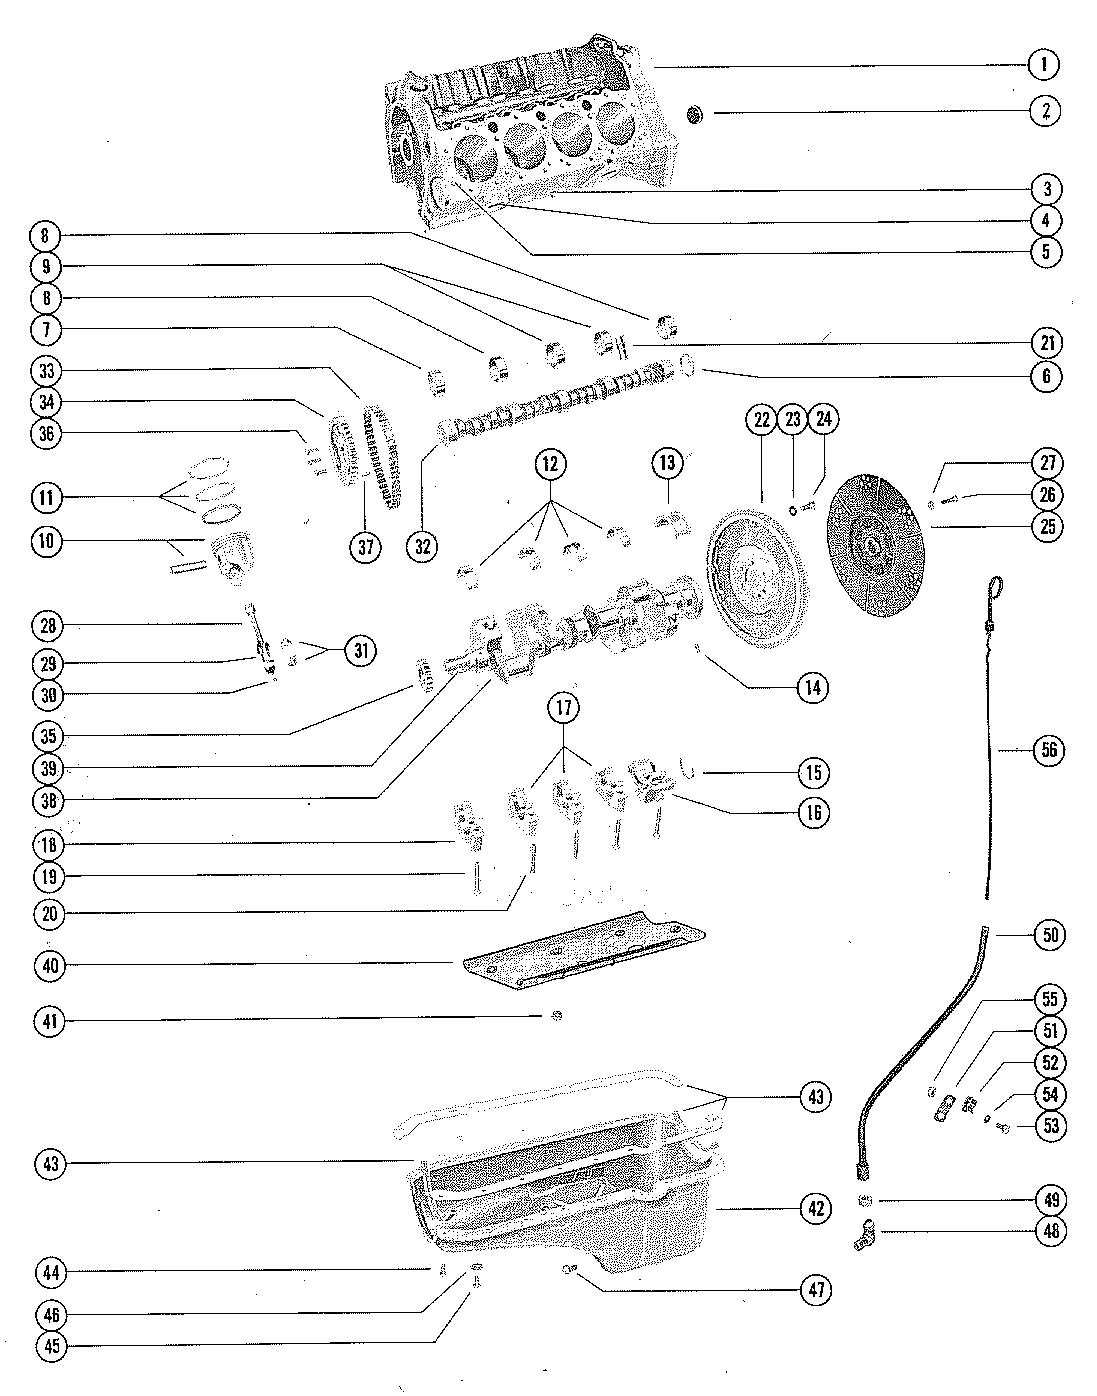 Cylinder Block Pistons And Crankshaft For 270 Engine Diagram Schedule